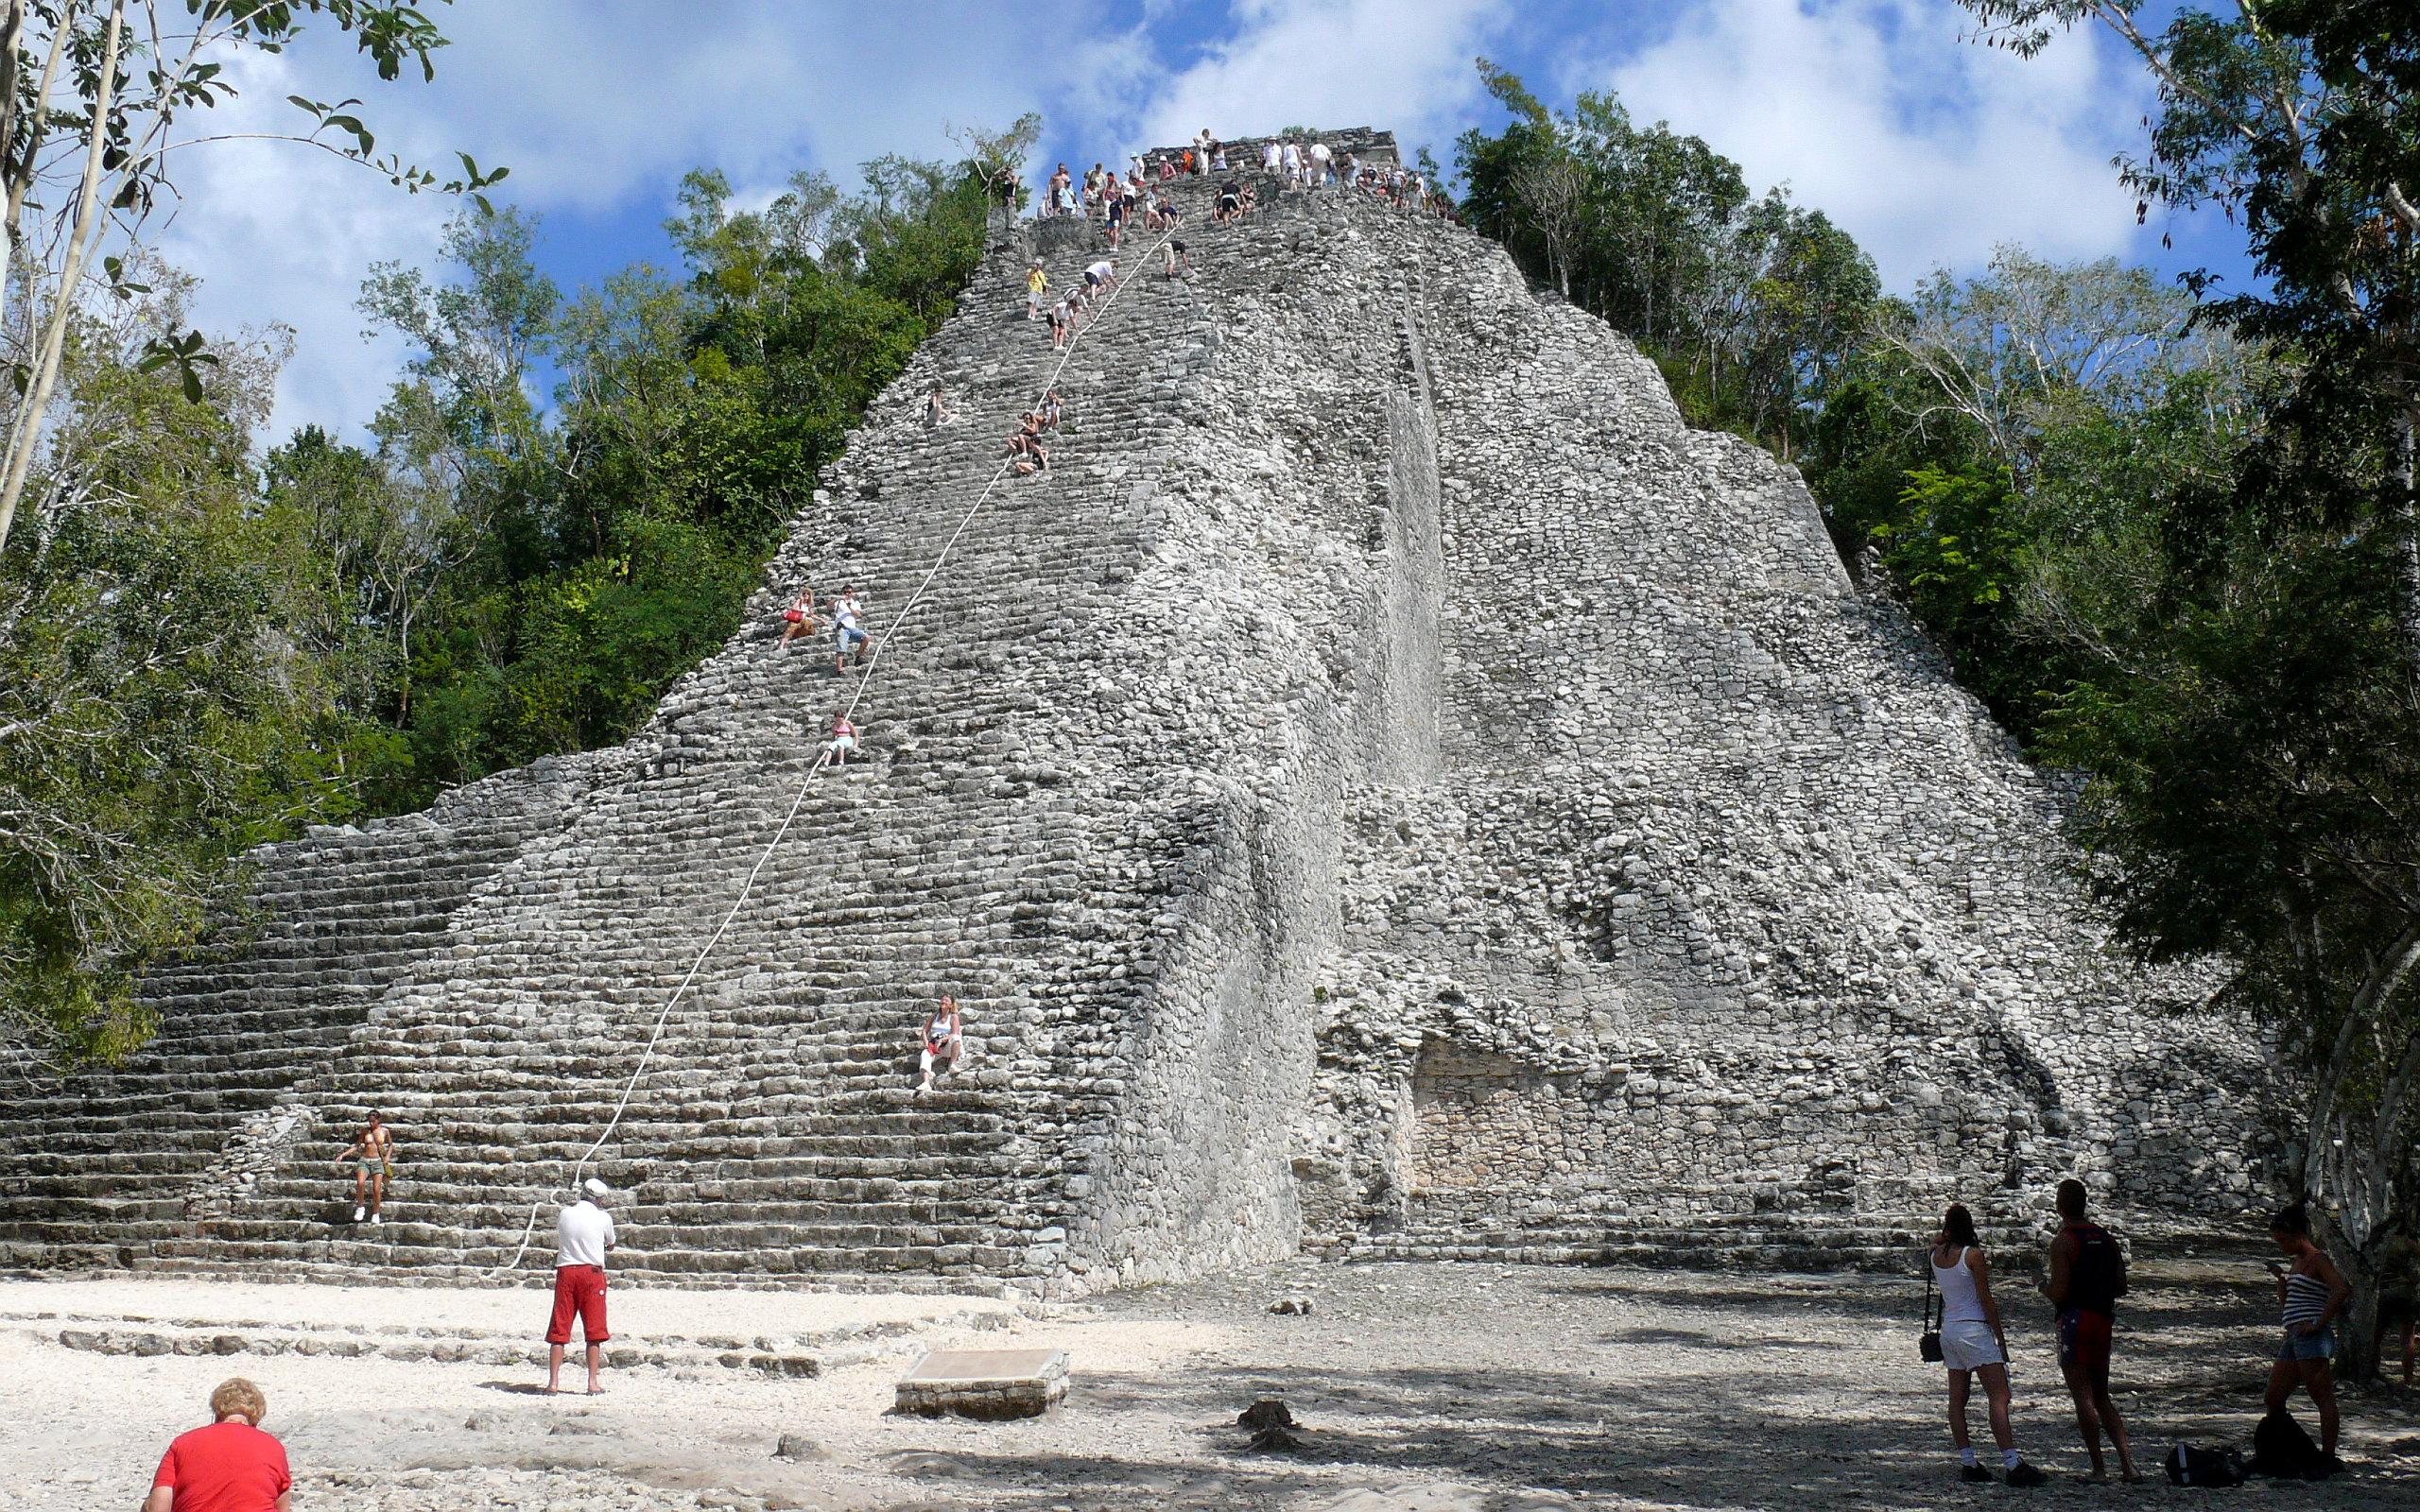 People Climbing Pyramid